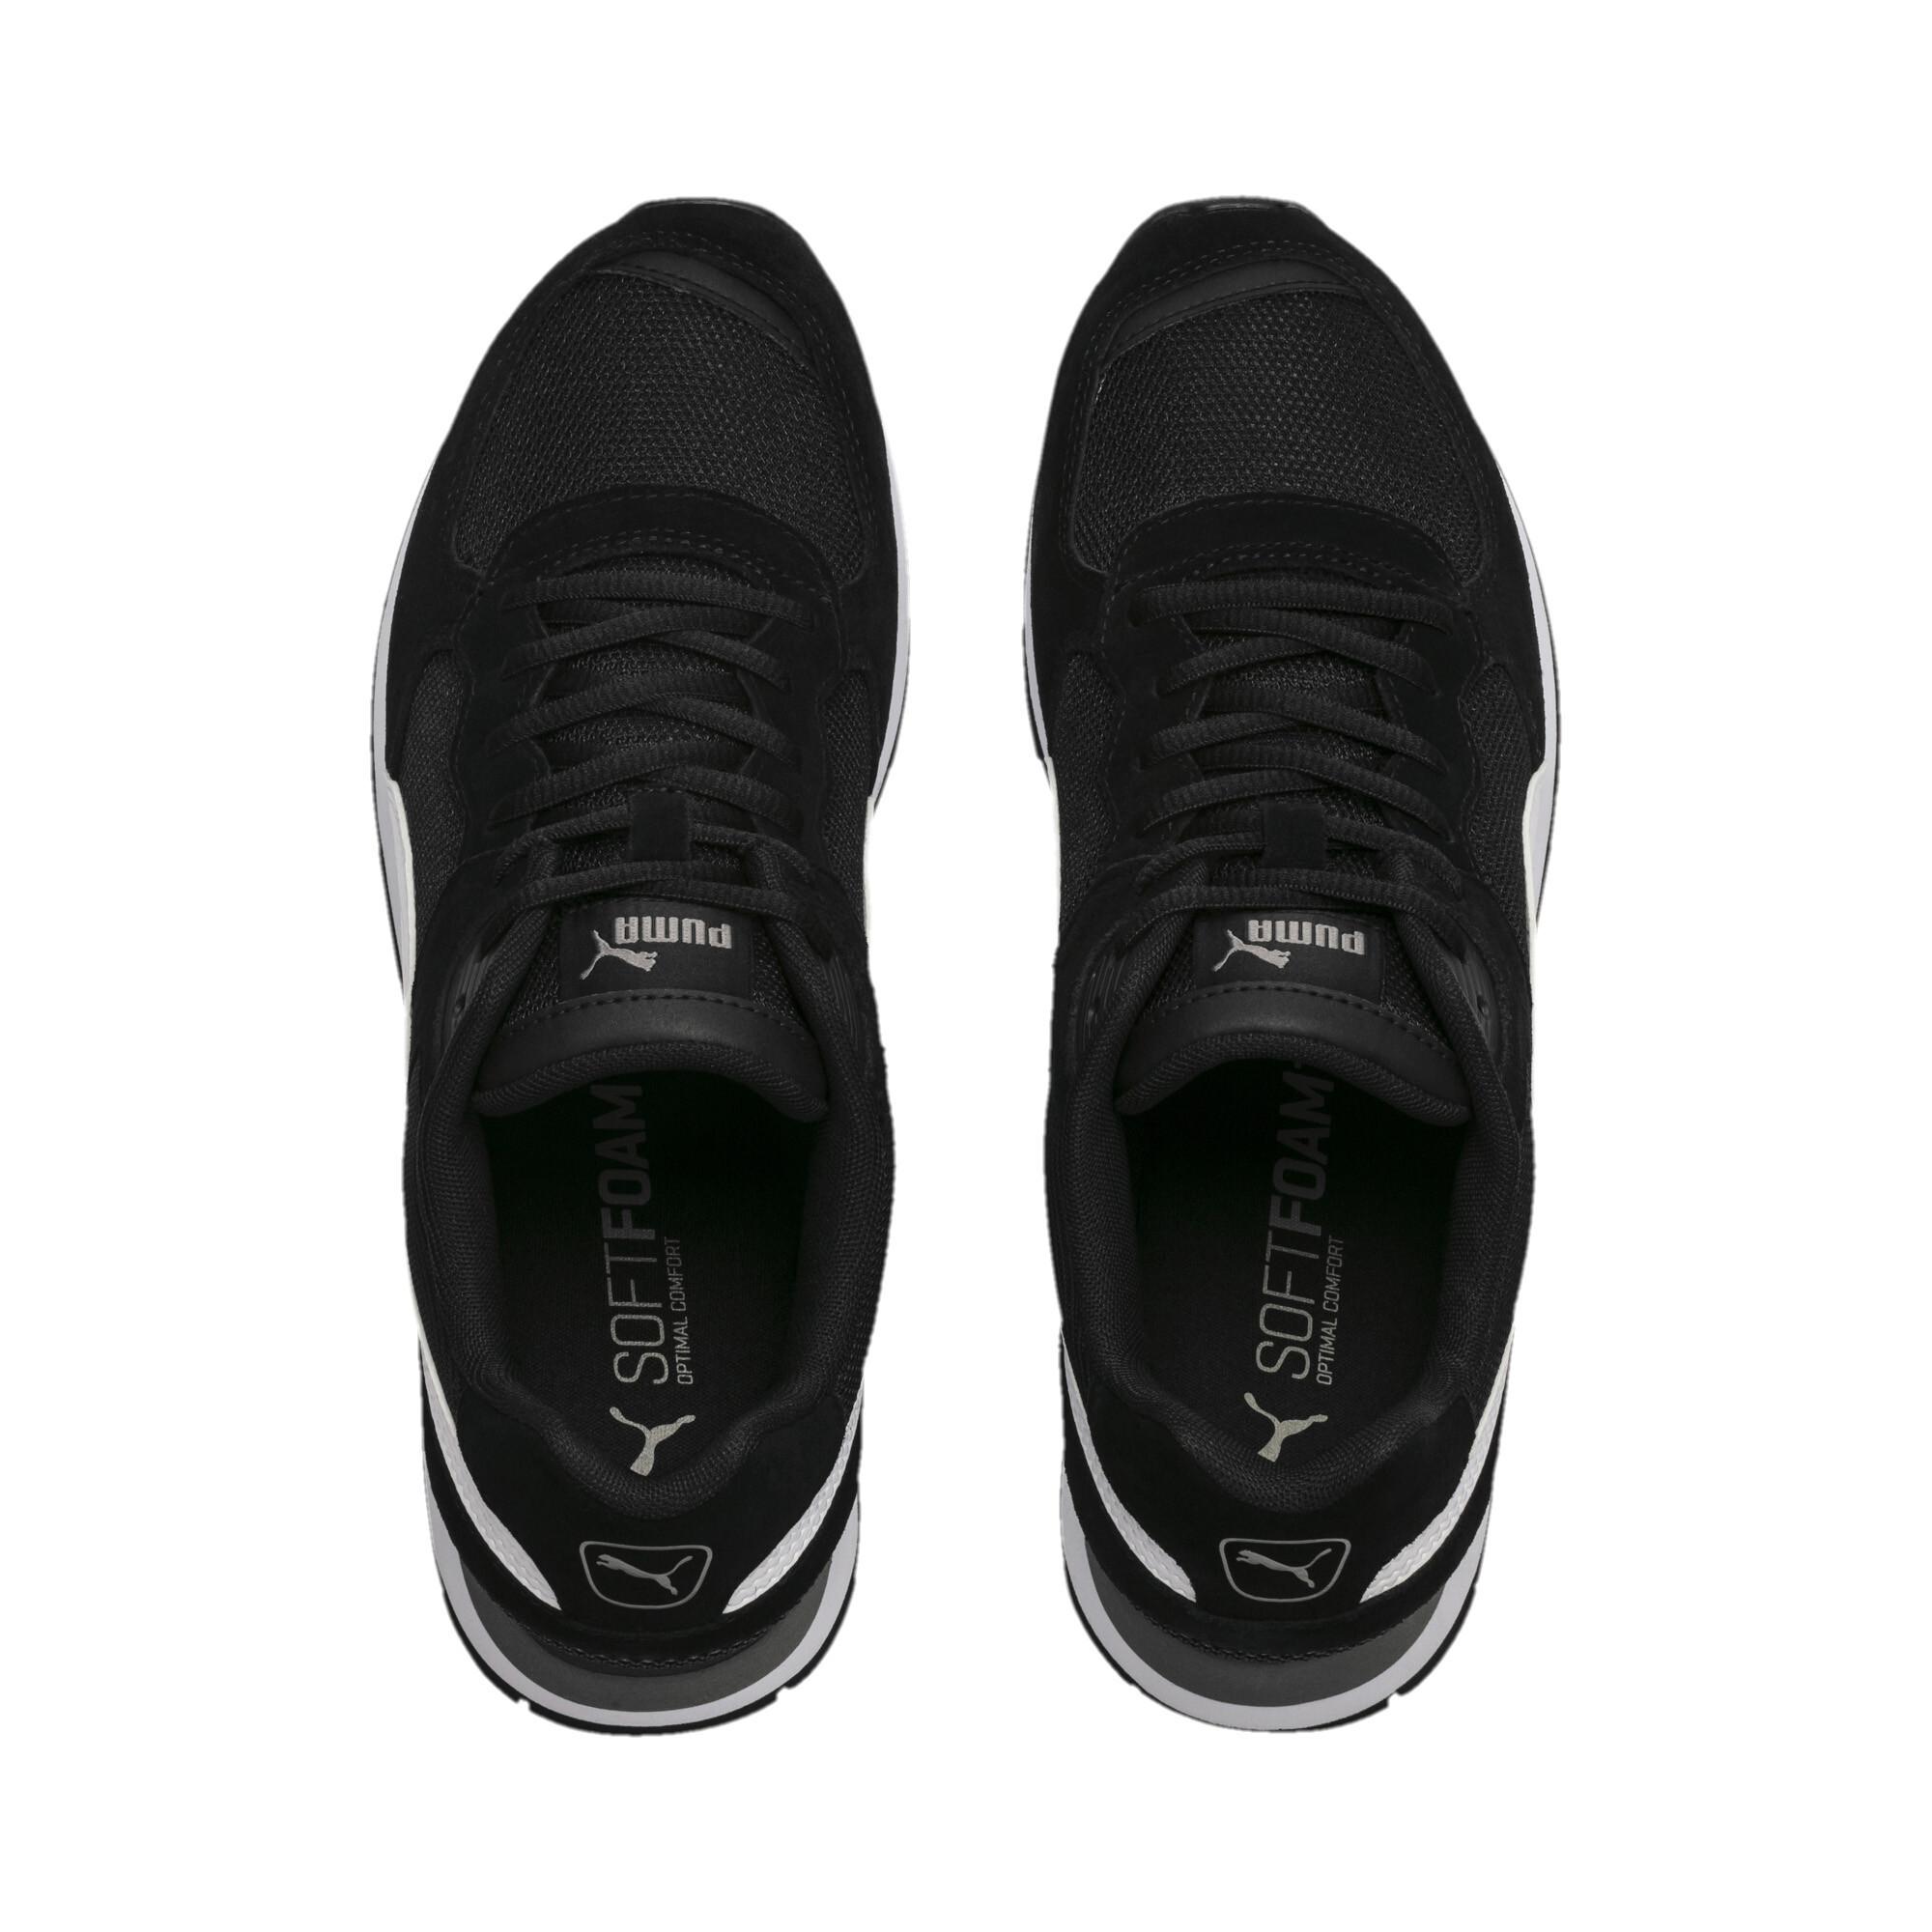 PUMA-Women-039-s-Vista-Sneakers thumbnail 8